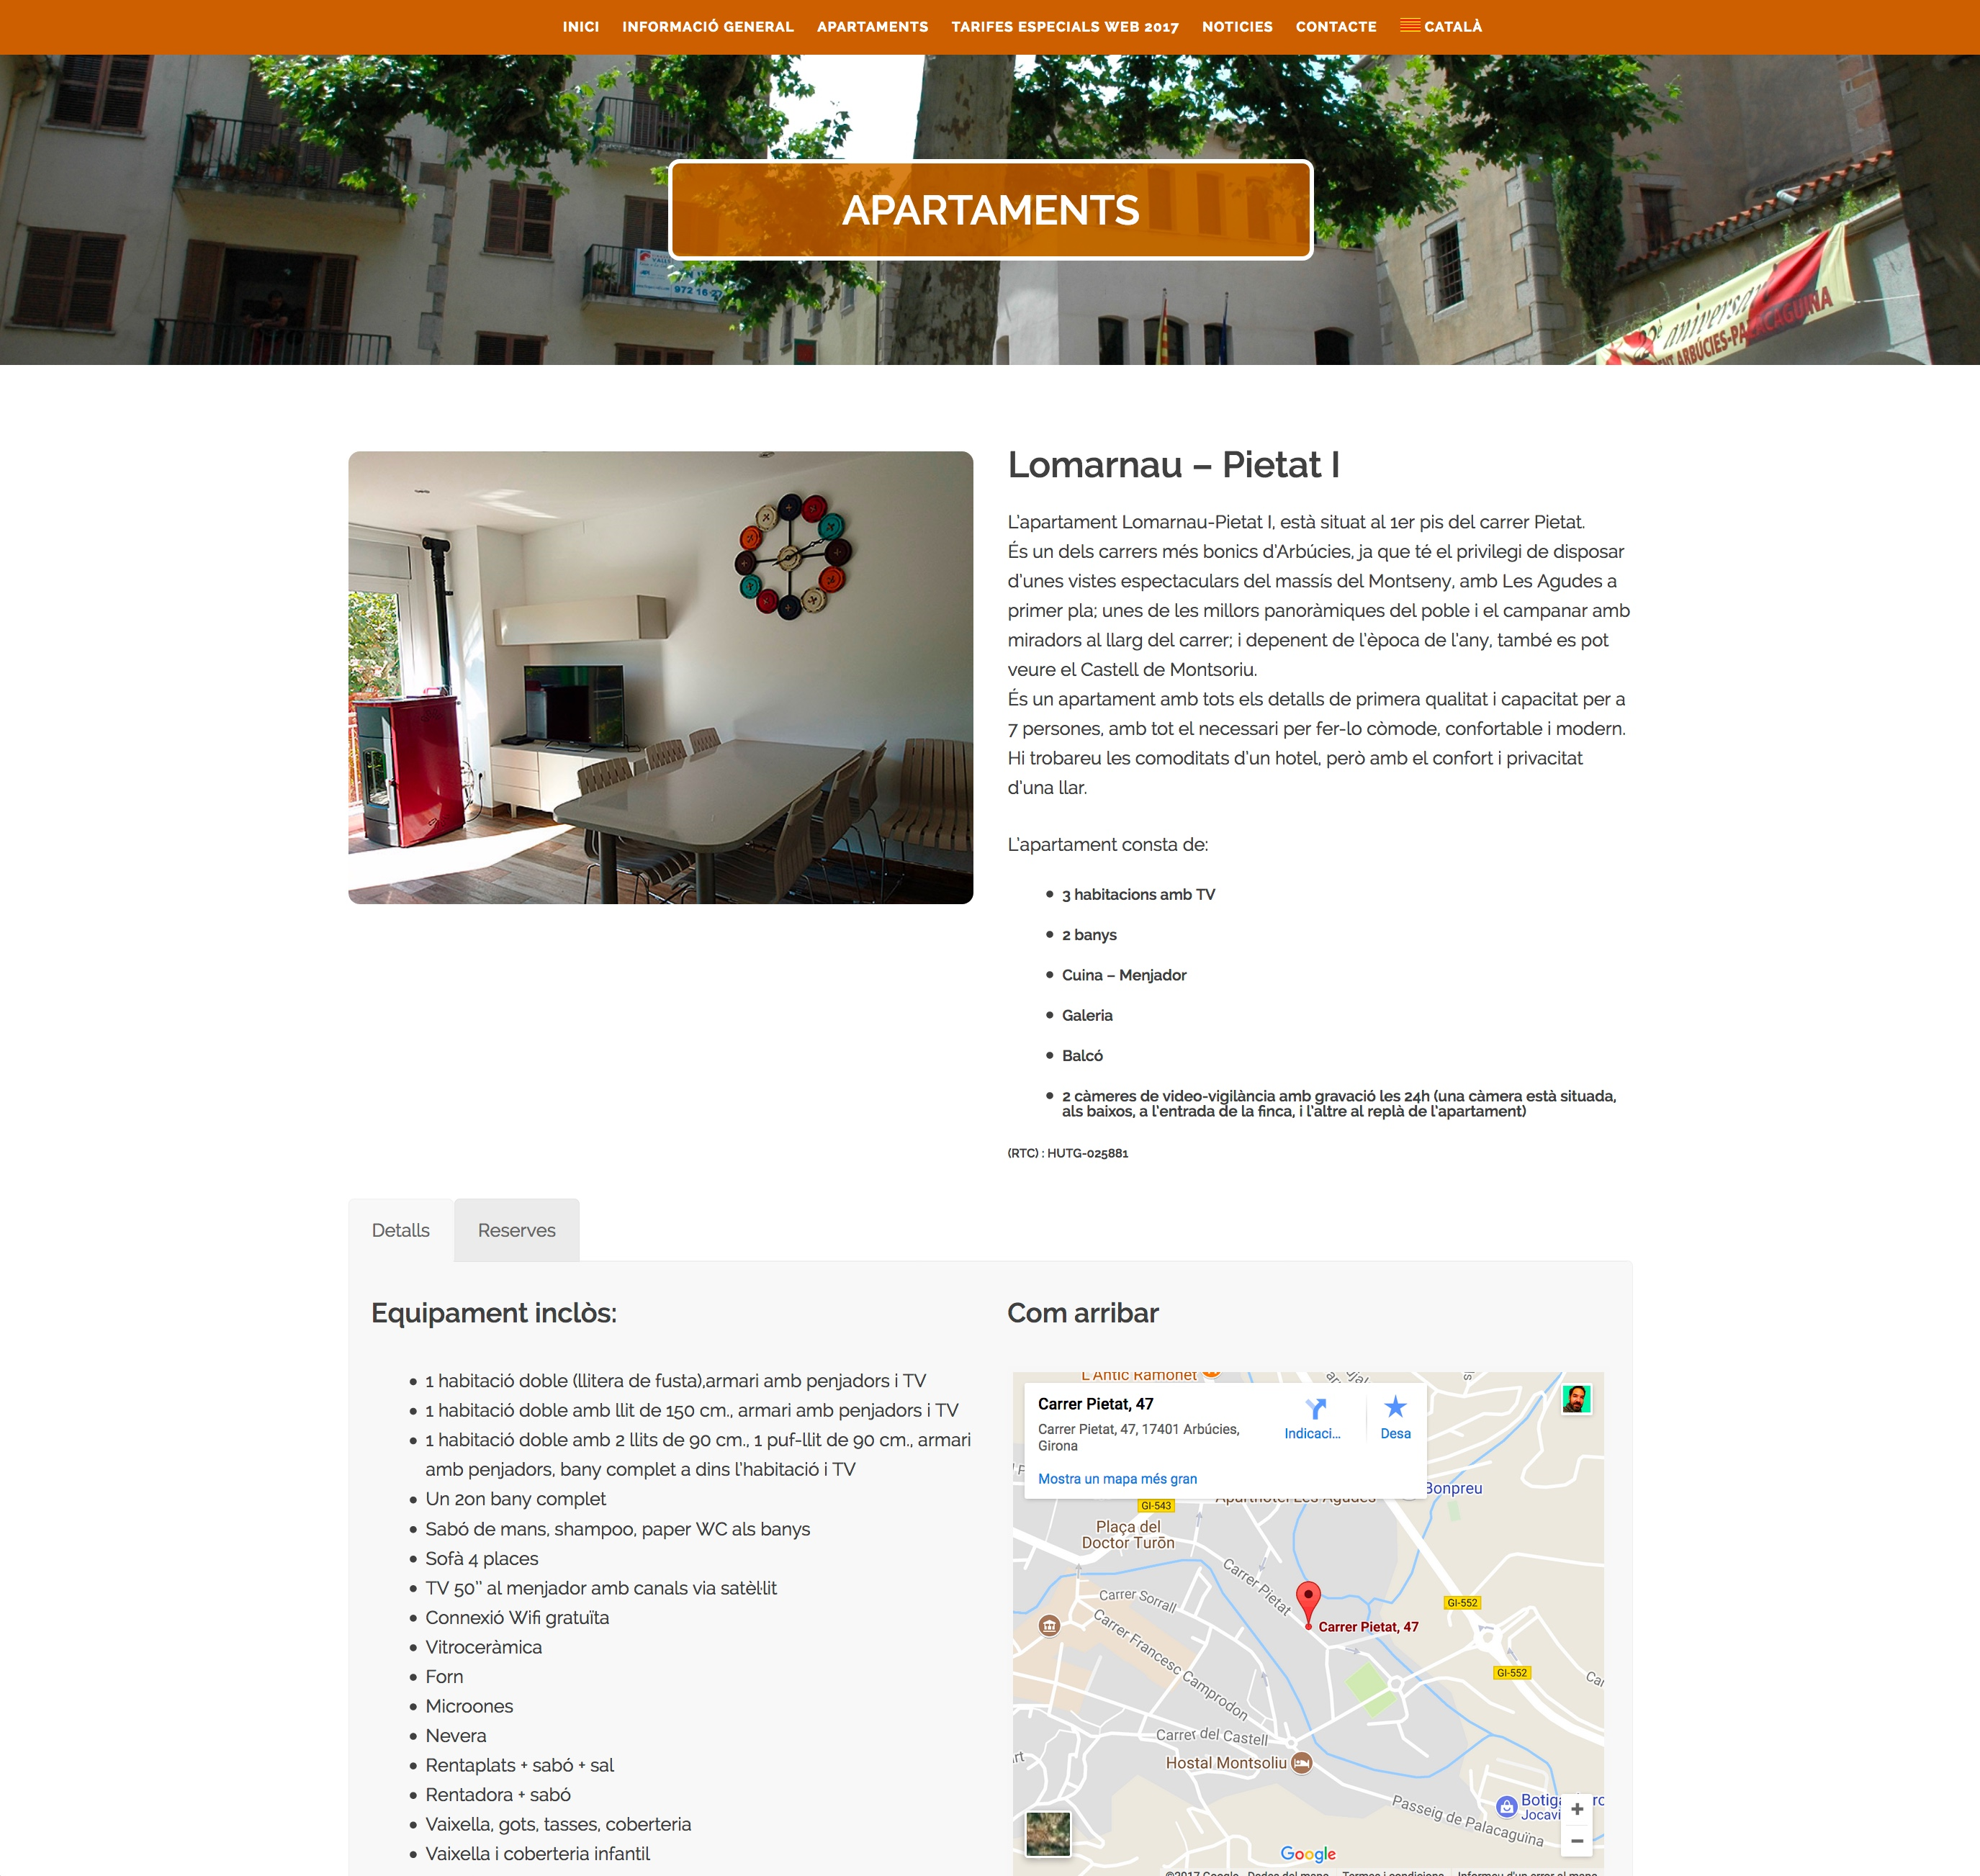 Apartaments Lomarnau